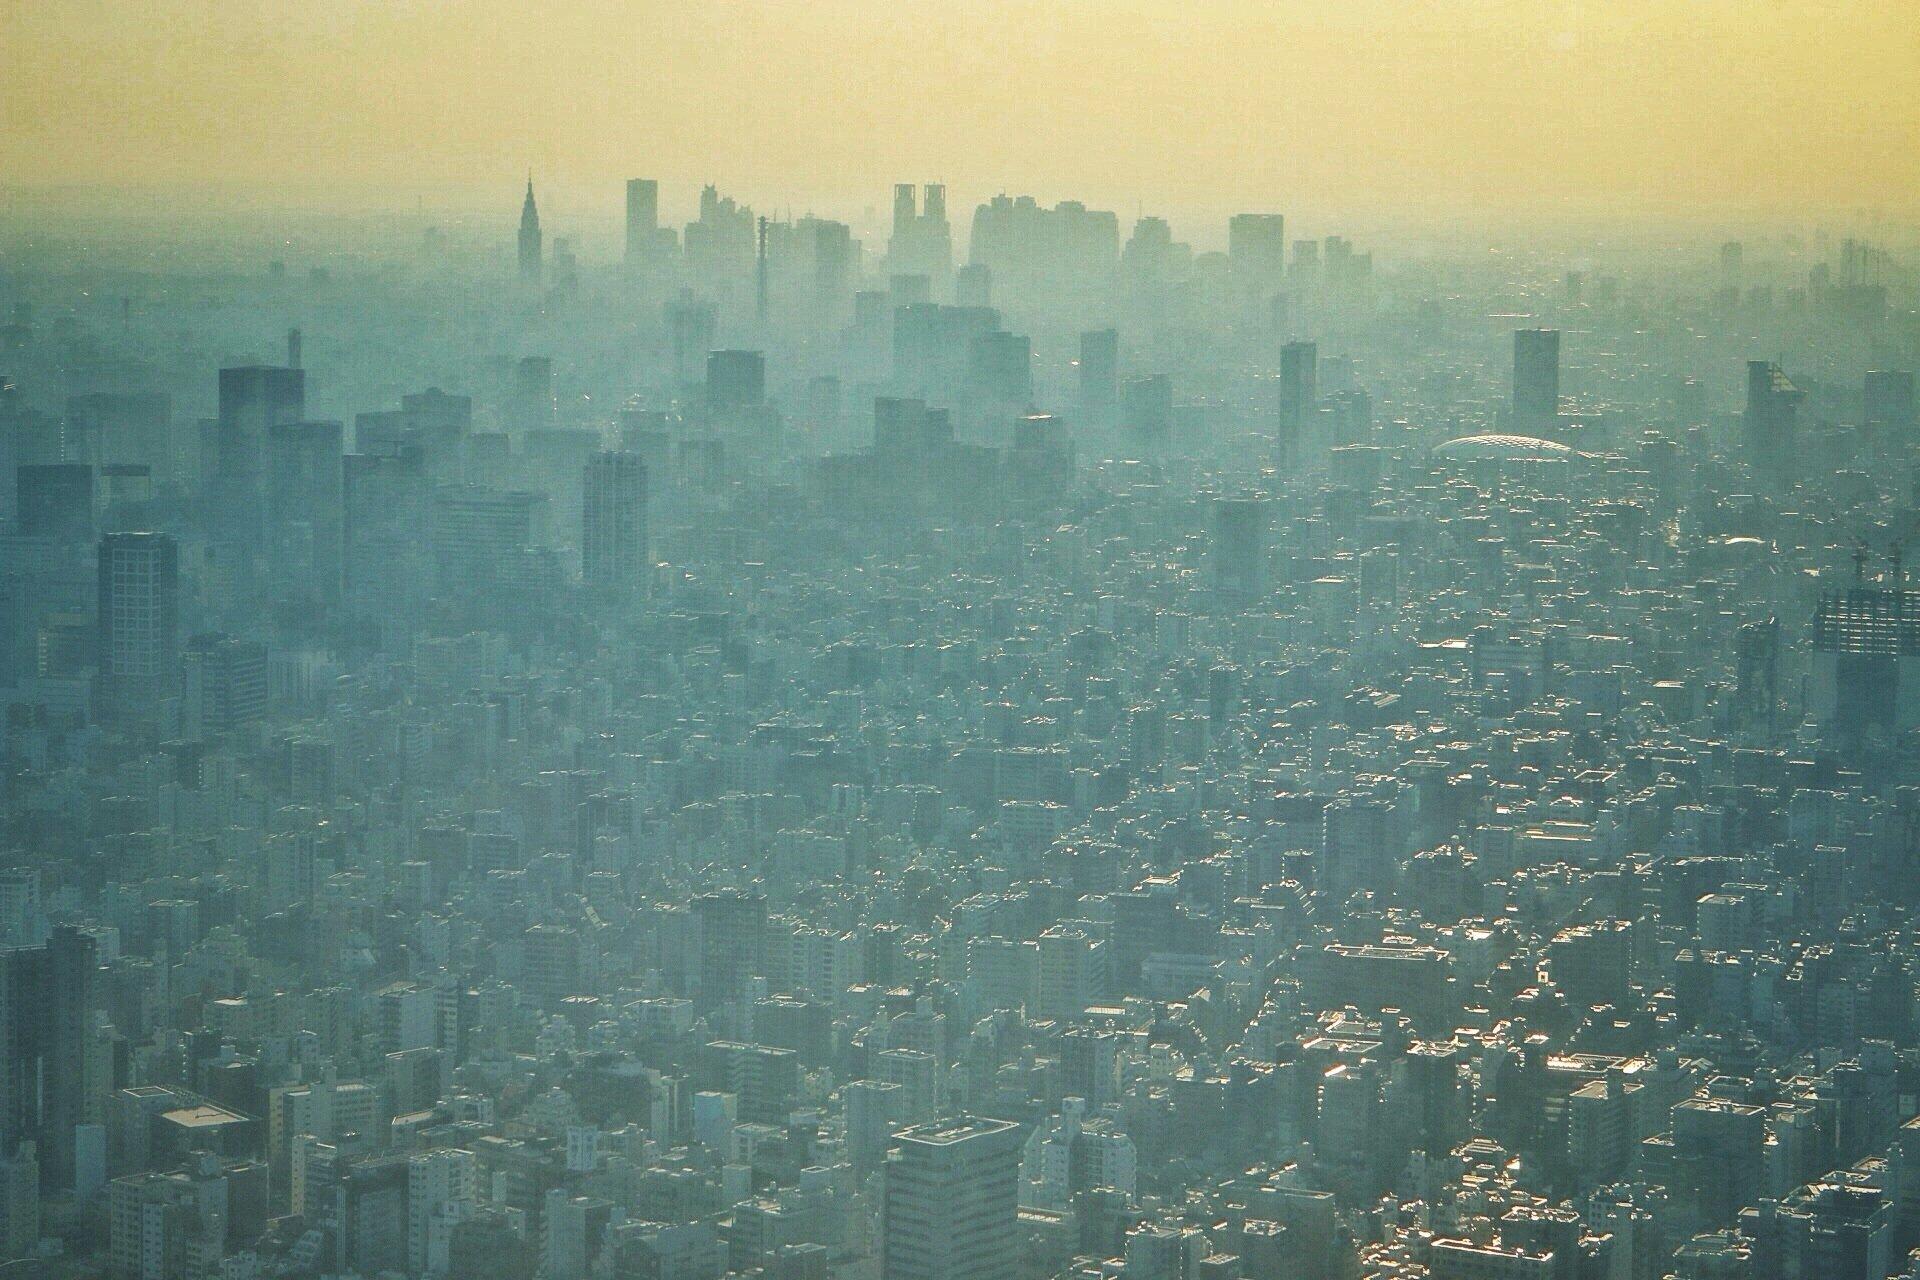 tokyo-from-above-4-kasuma-photo-blog